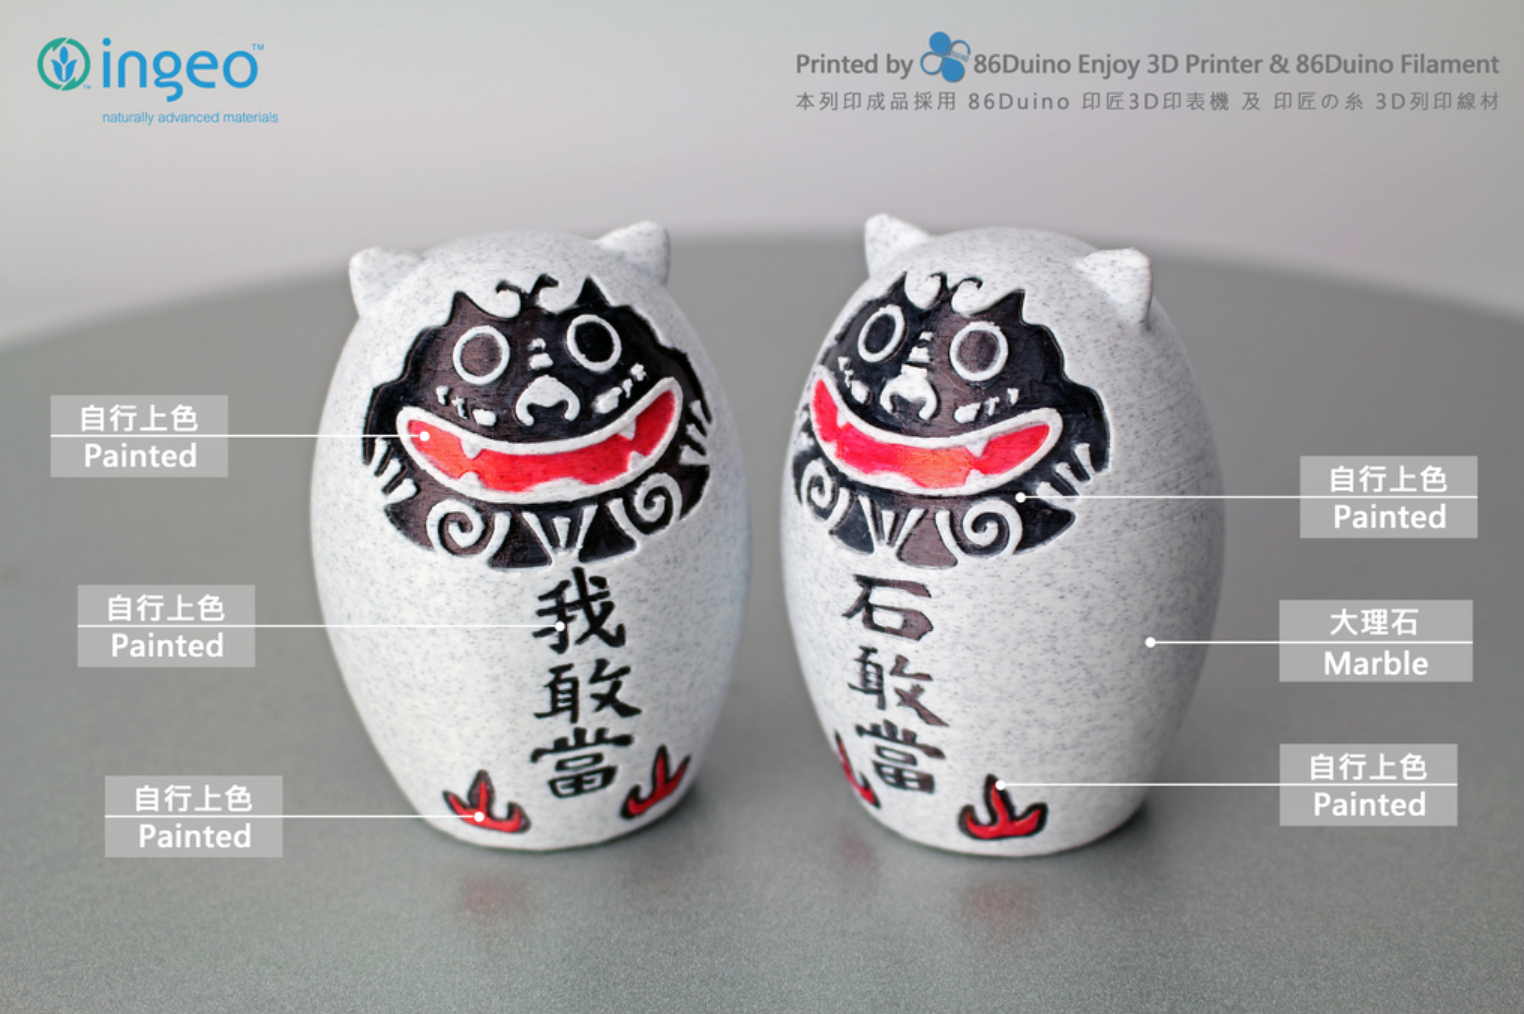 Capture d'écran 2017-12-20 à 11.23.46.png Download free STL file 86Duino Shigandang • 3D print design, 86Duino